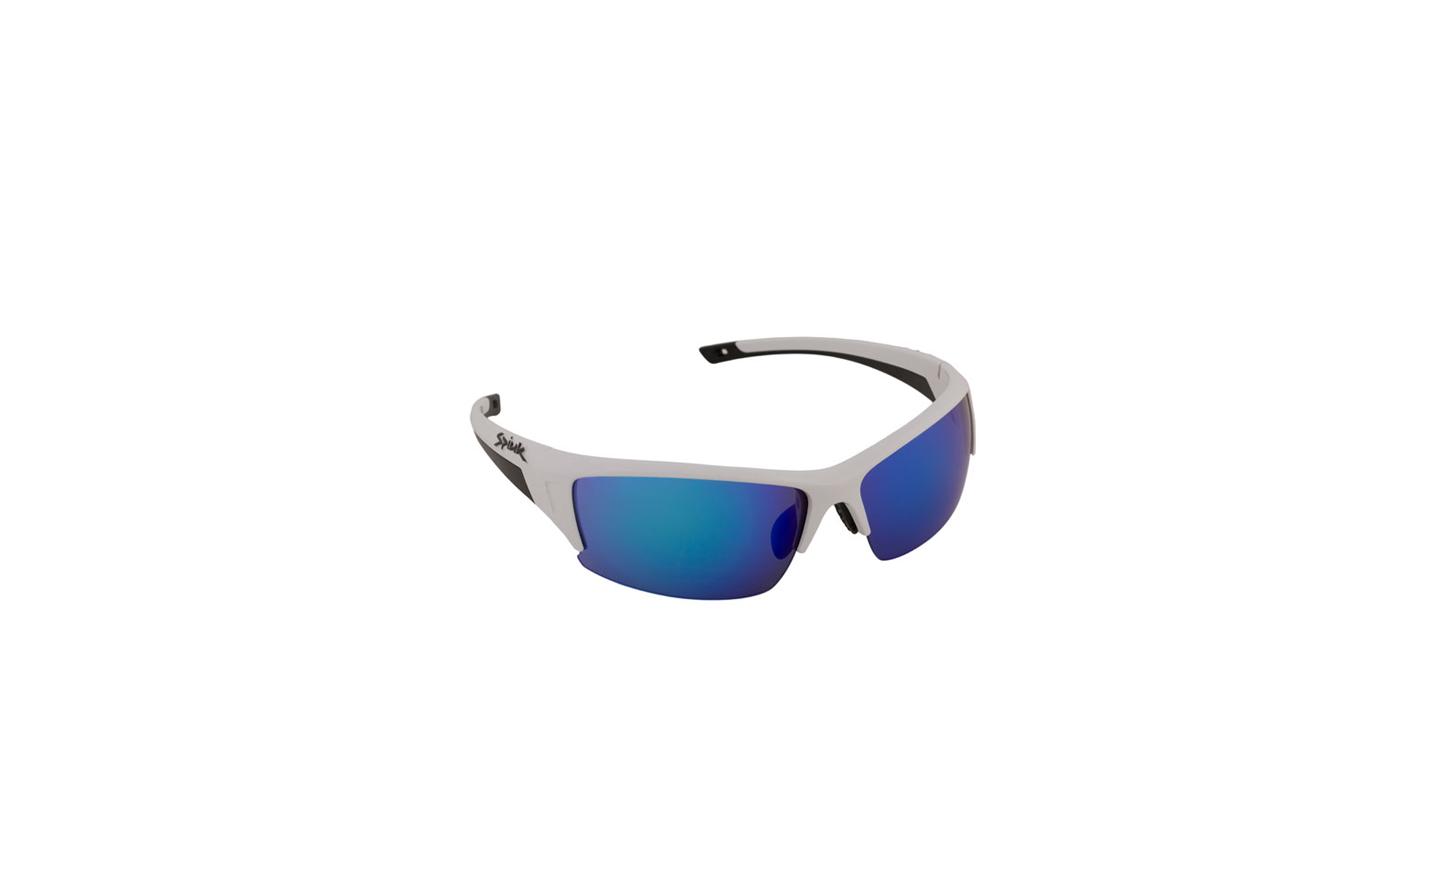 6d0ebbd80e Gafas Spiuk Binomio Lente Espejo Azul Blanco Negro - Fabregues ...